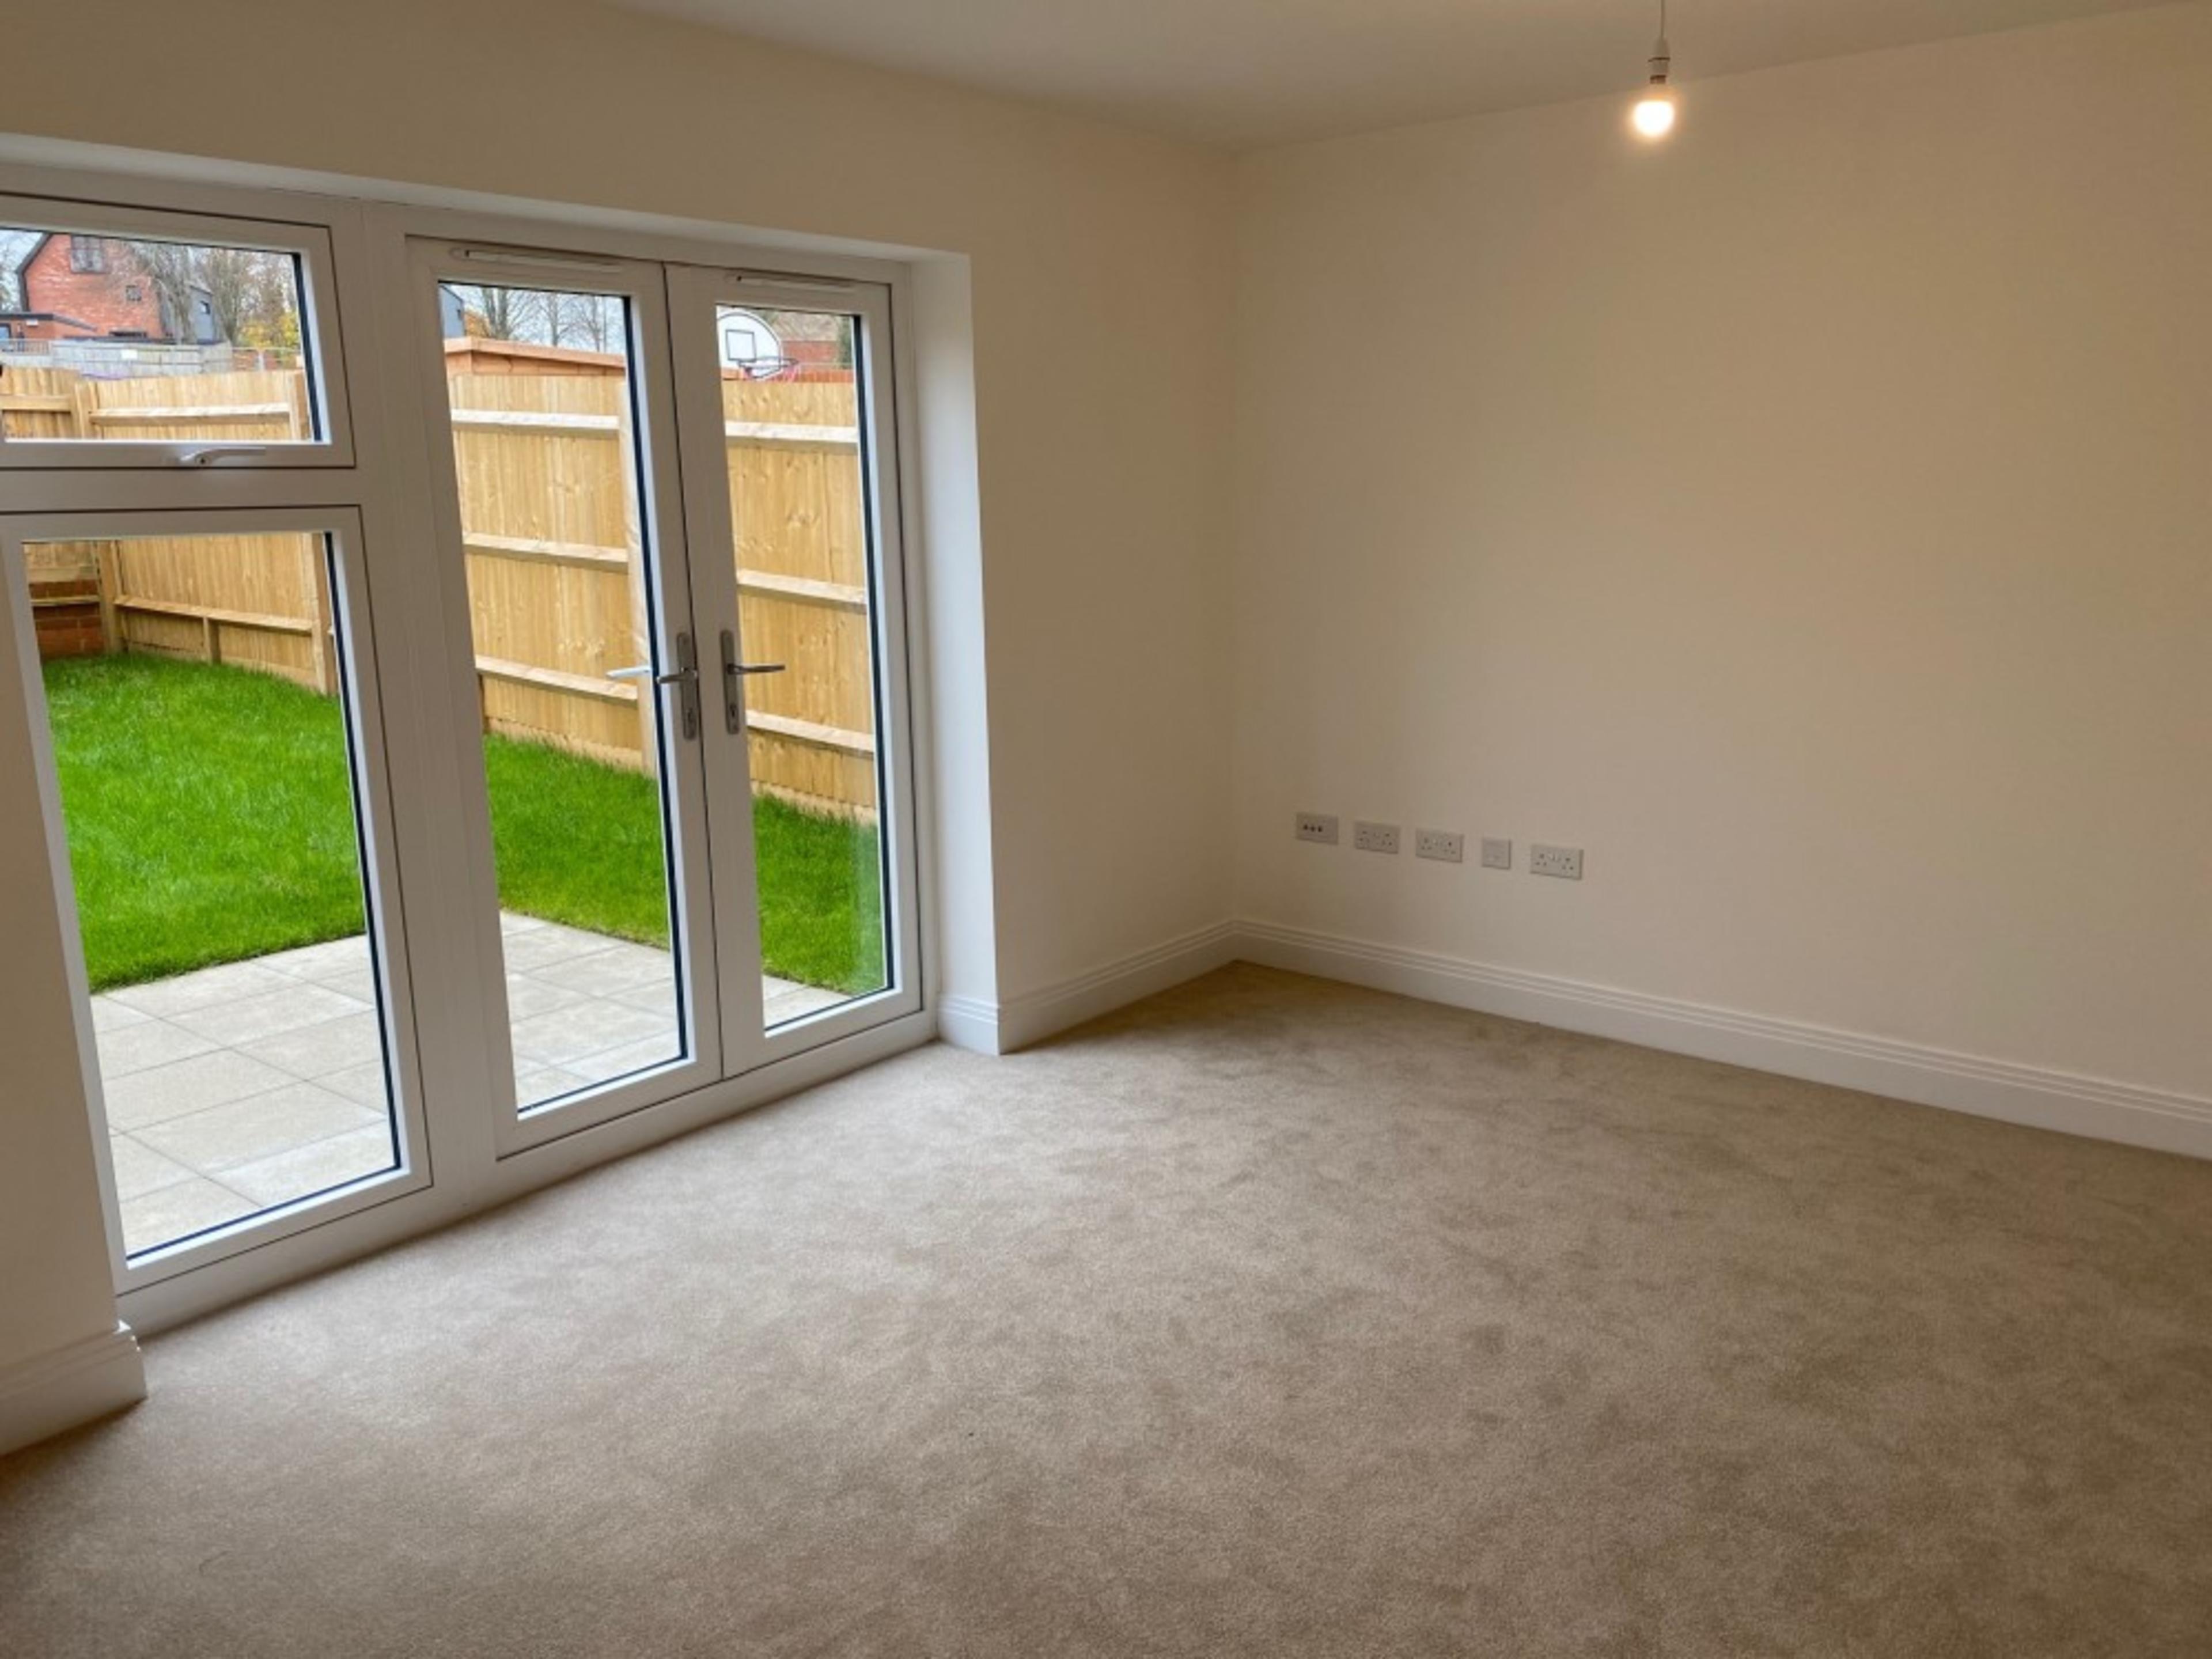 Kings Barton - 3 bed - Living room